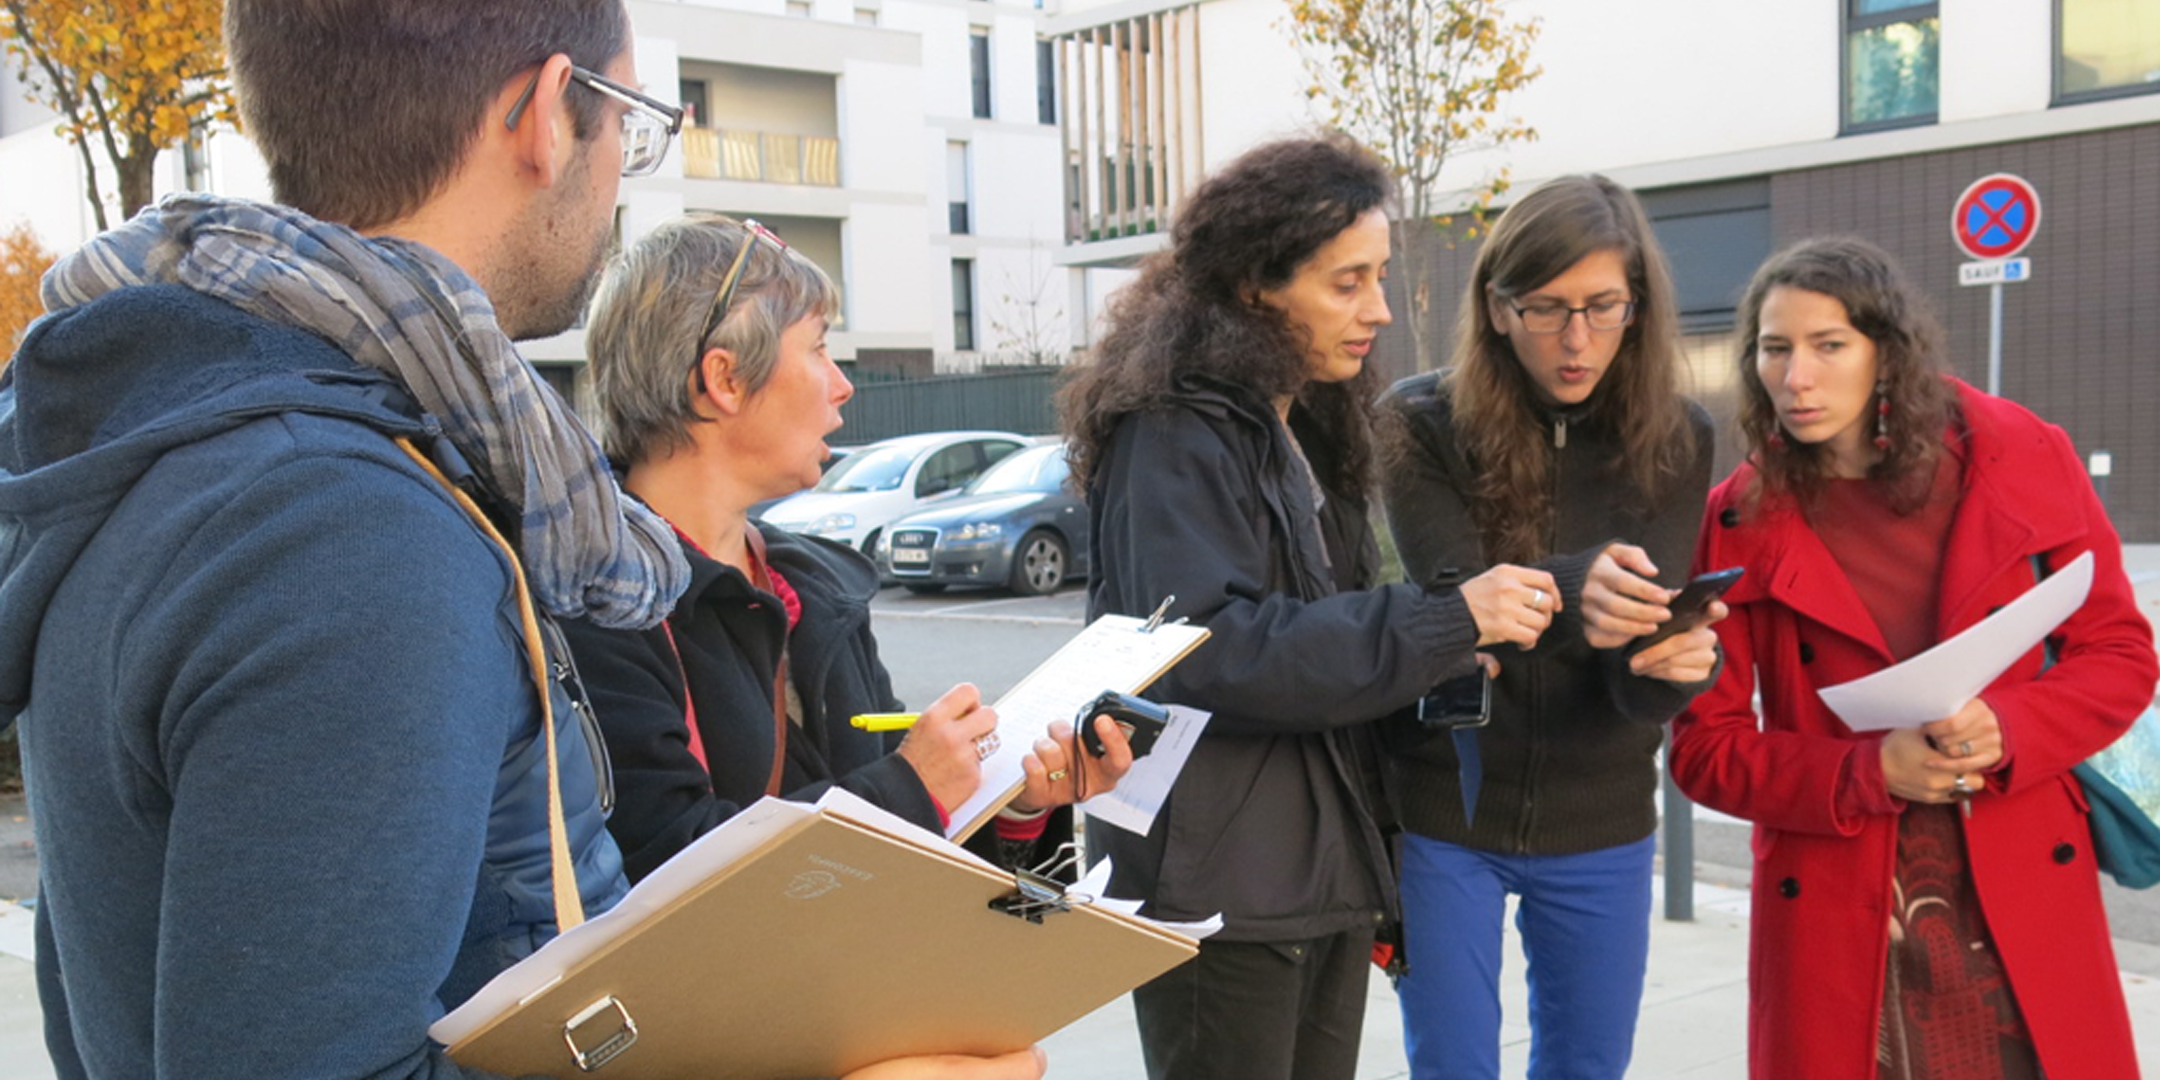 Atelier Cartographie de terrain : contribuer